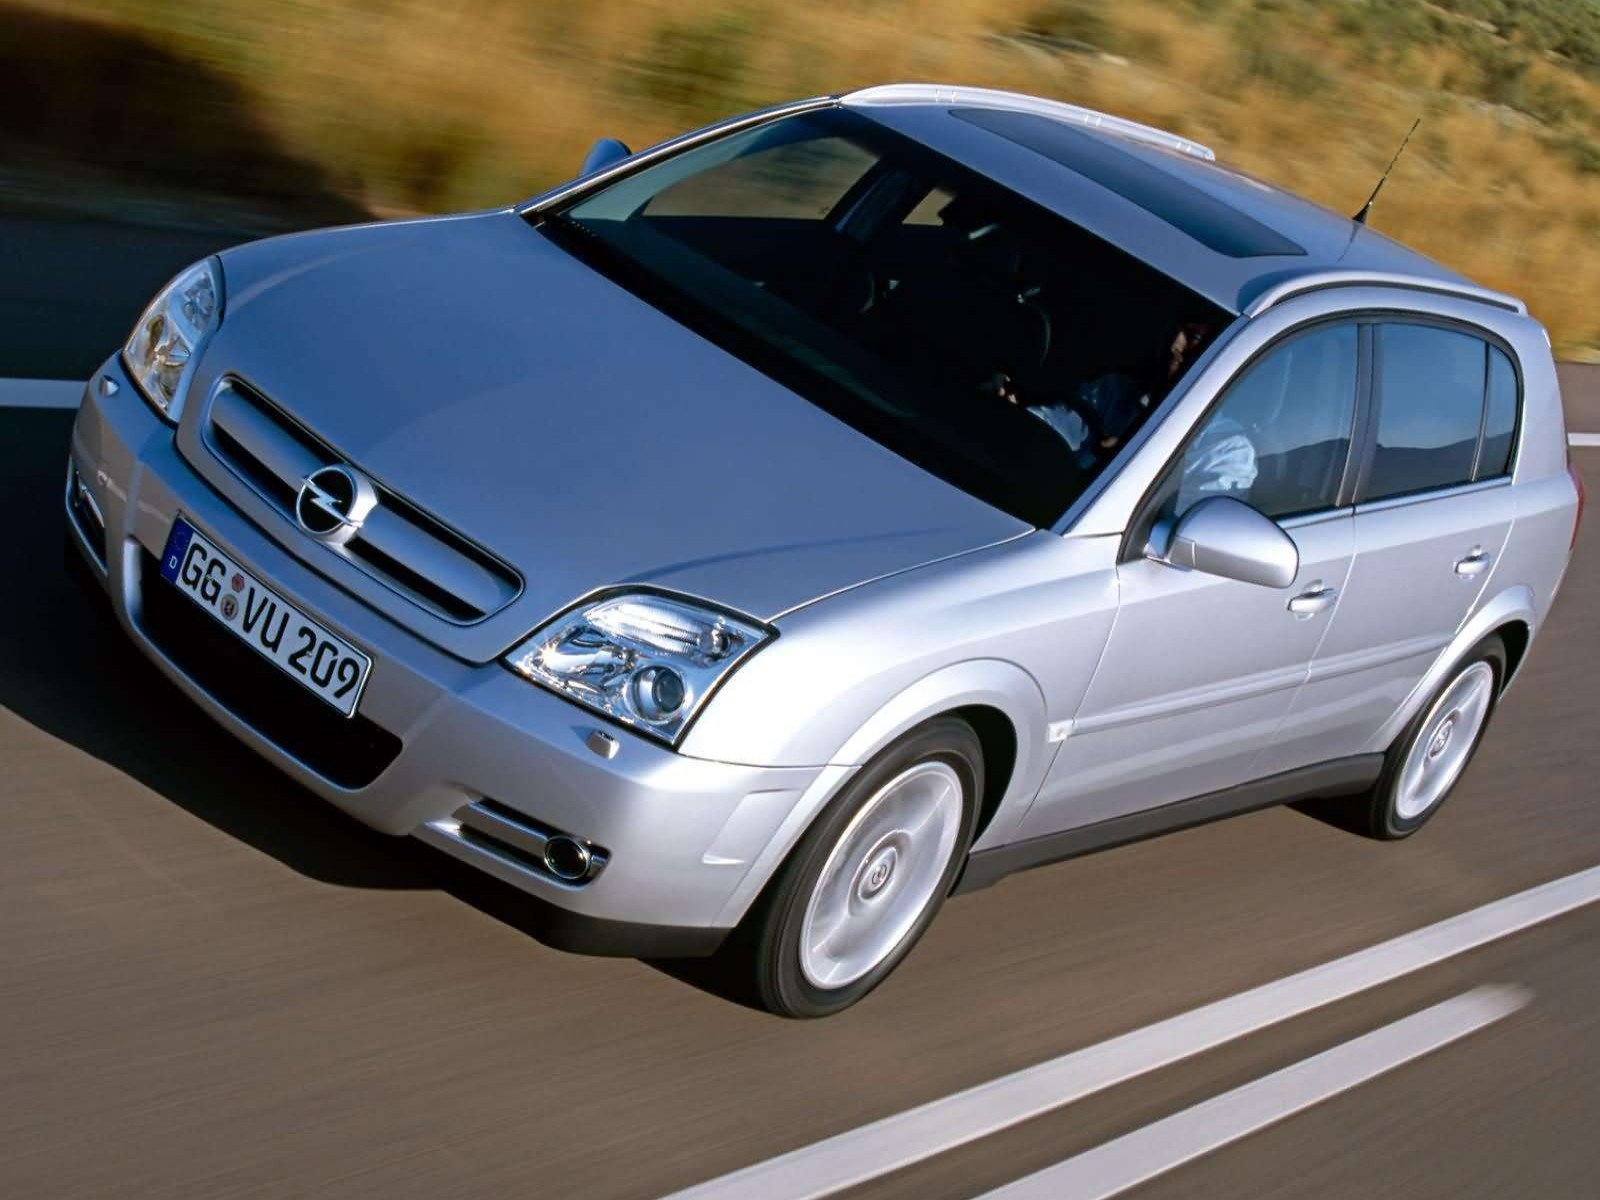 Car and car zone opel signum 30 dti 2003 new cars car reviews opel signum 30 dti 2003 vanachro Images